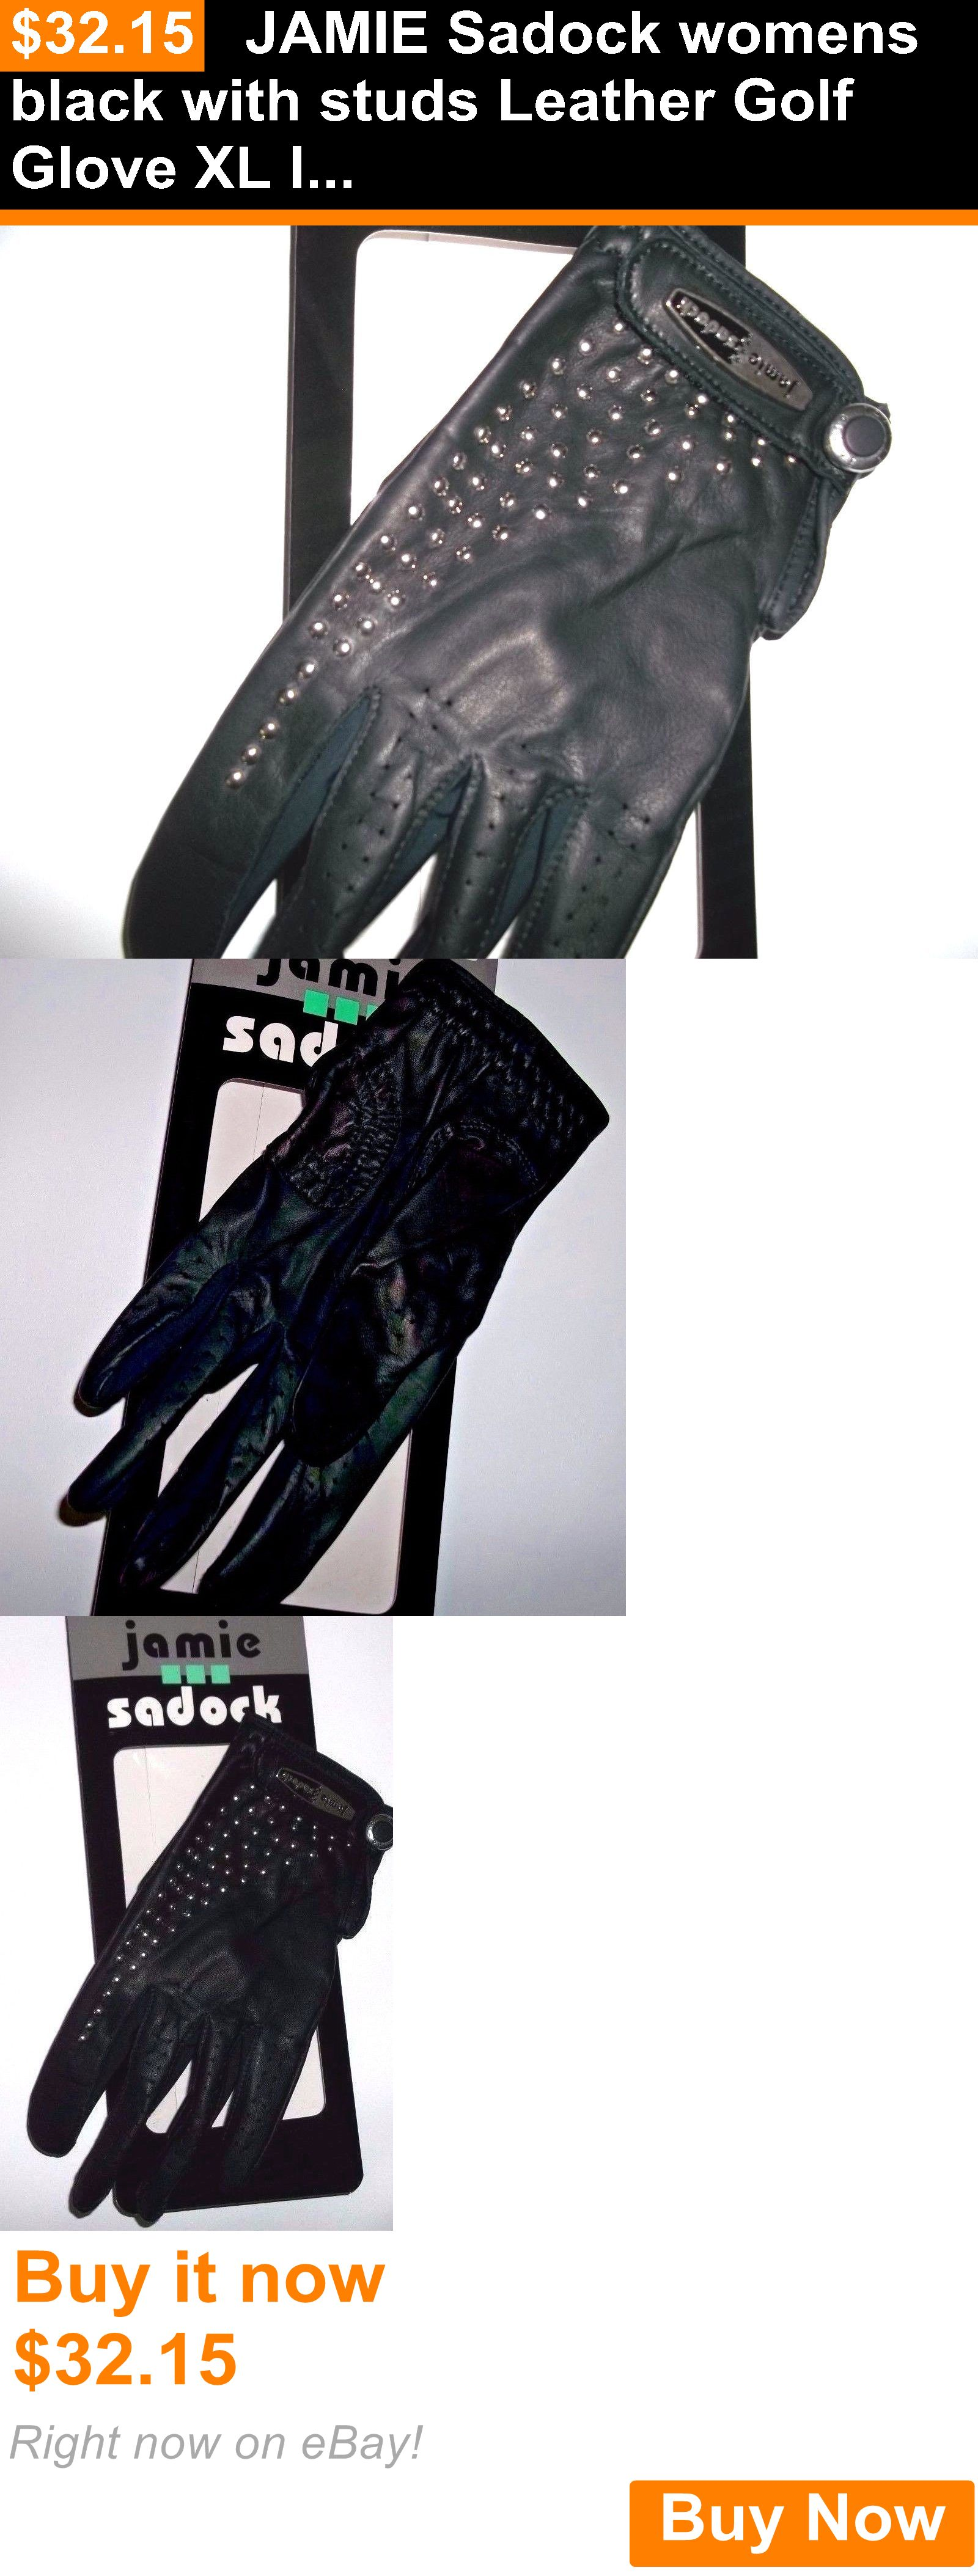 Black leather golf gloves - Golf Gloves 181146 Jamie Sadock Womens Black With Studs Leather Golf Glove Xl Left Buy It Now Only 32 15 Golf Gloves 181146 Pinterest